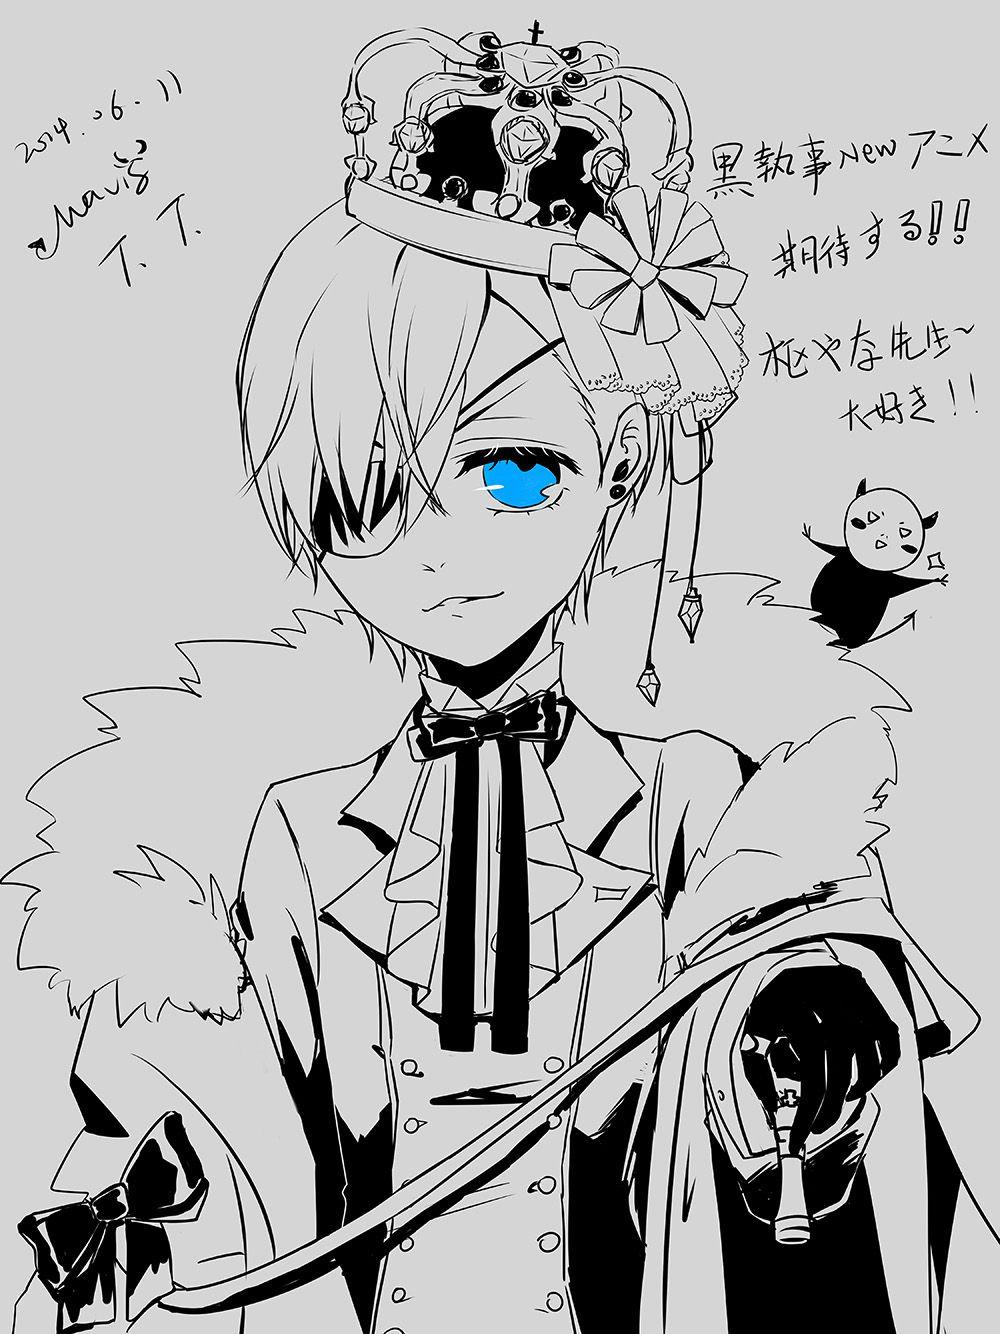 Anime boy, , manga boy, , Ciel Phantomhive, , Kuroshitsuji